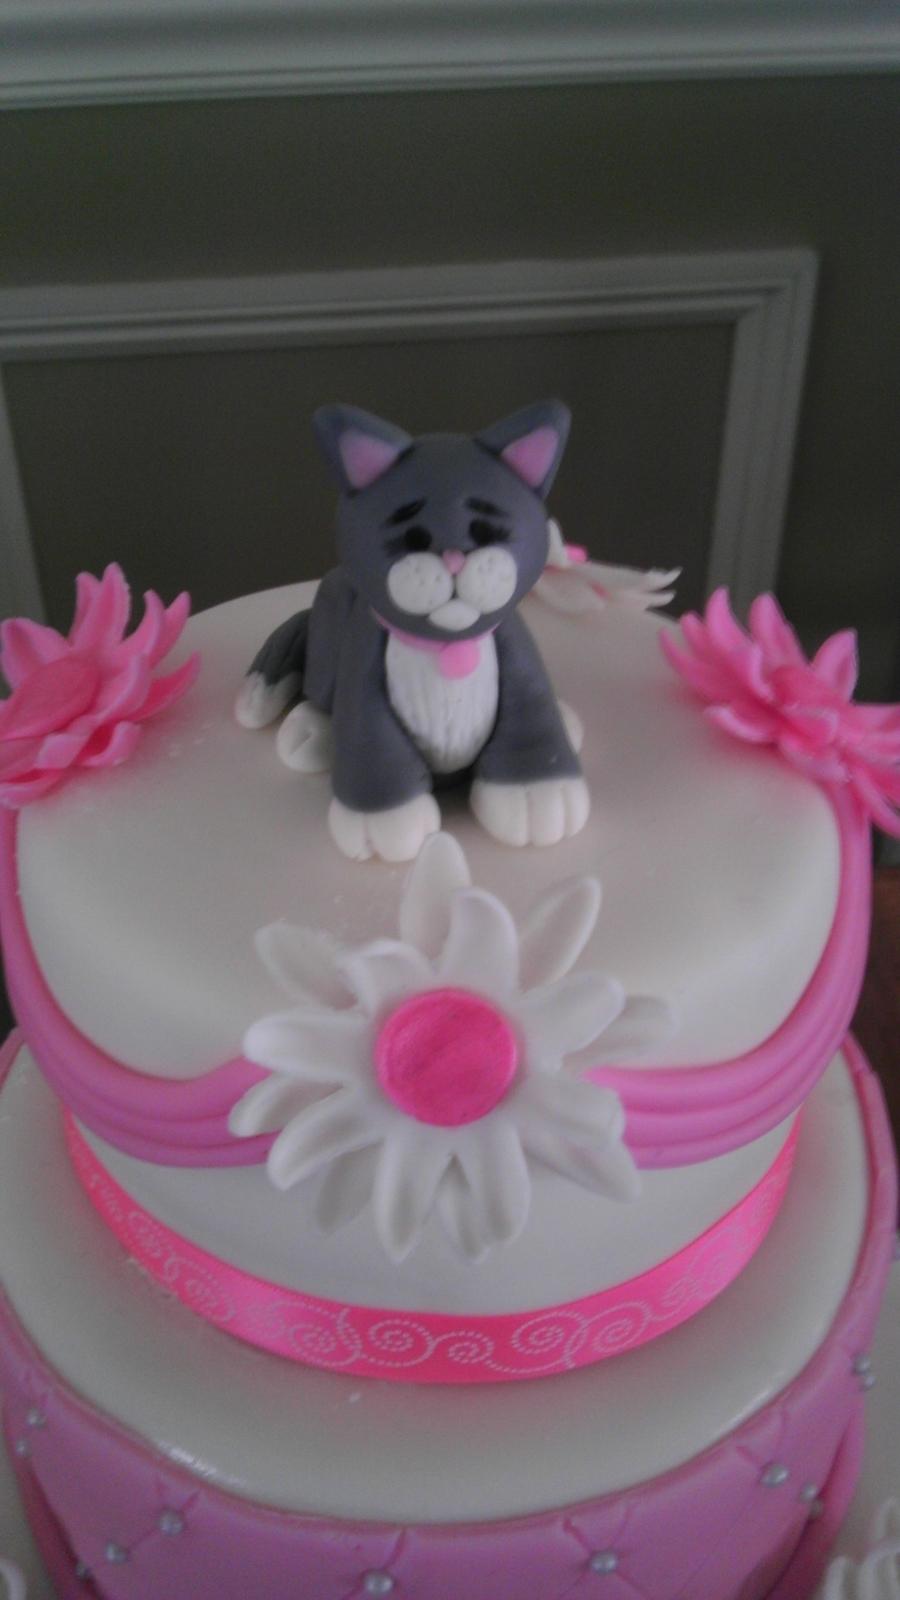 Cat Cake Topper - CakeCentral.com